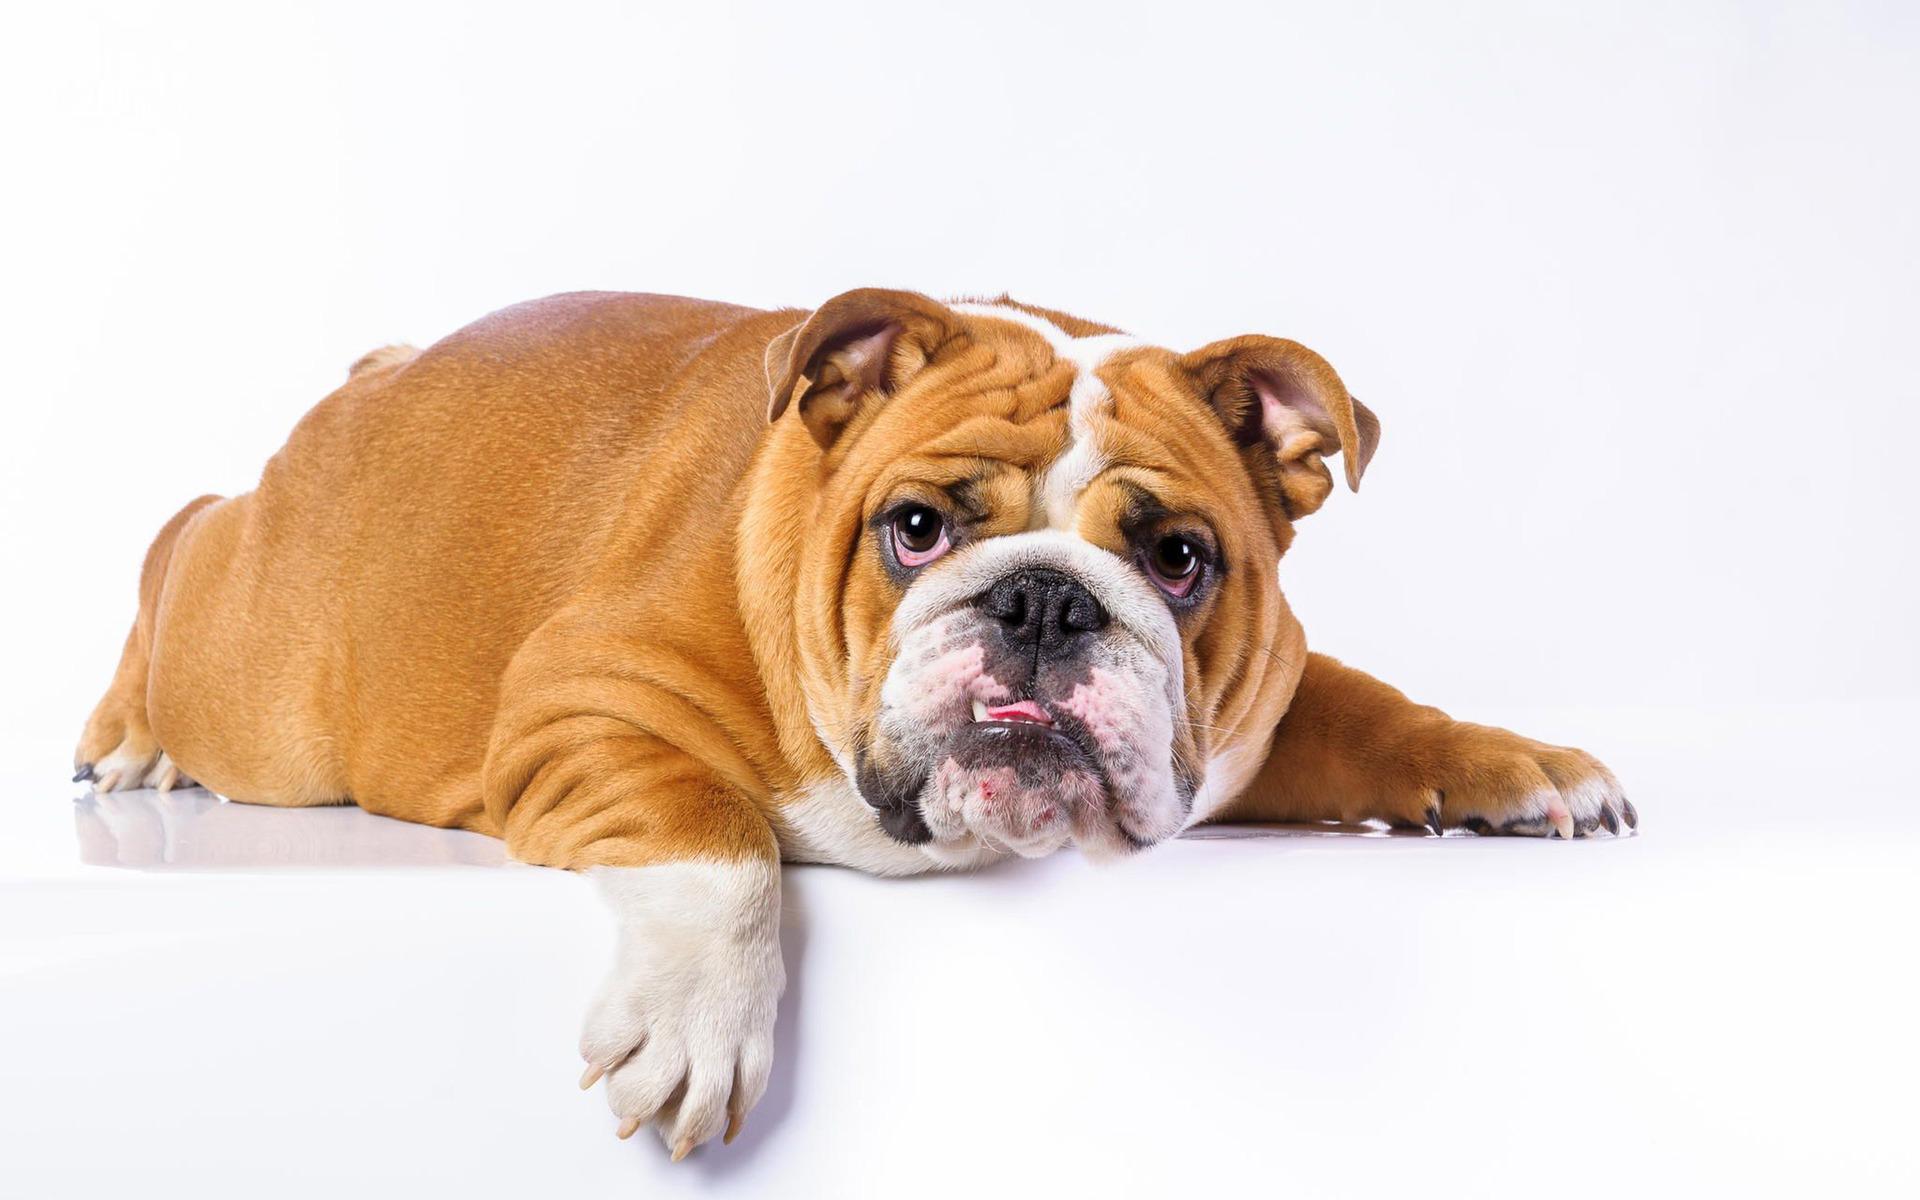 Cute english bulldog puppies wallpaper